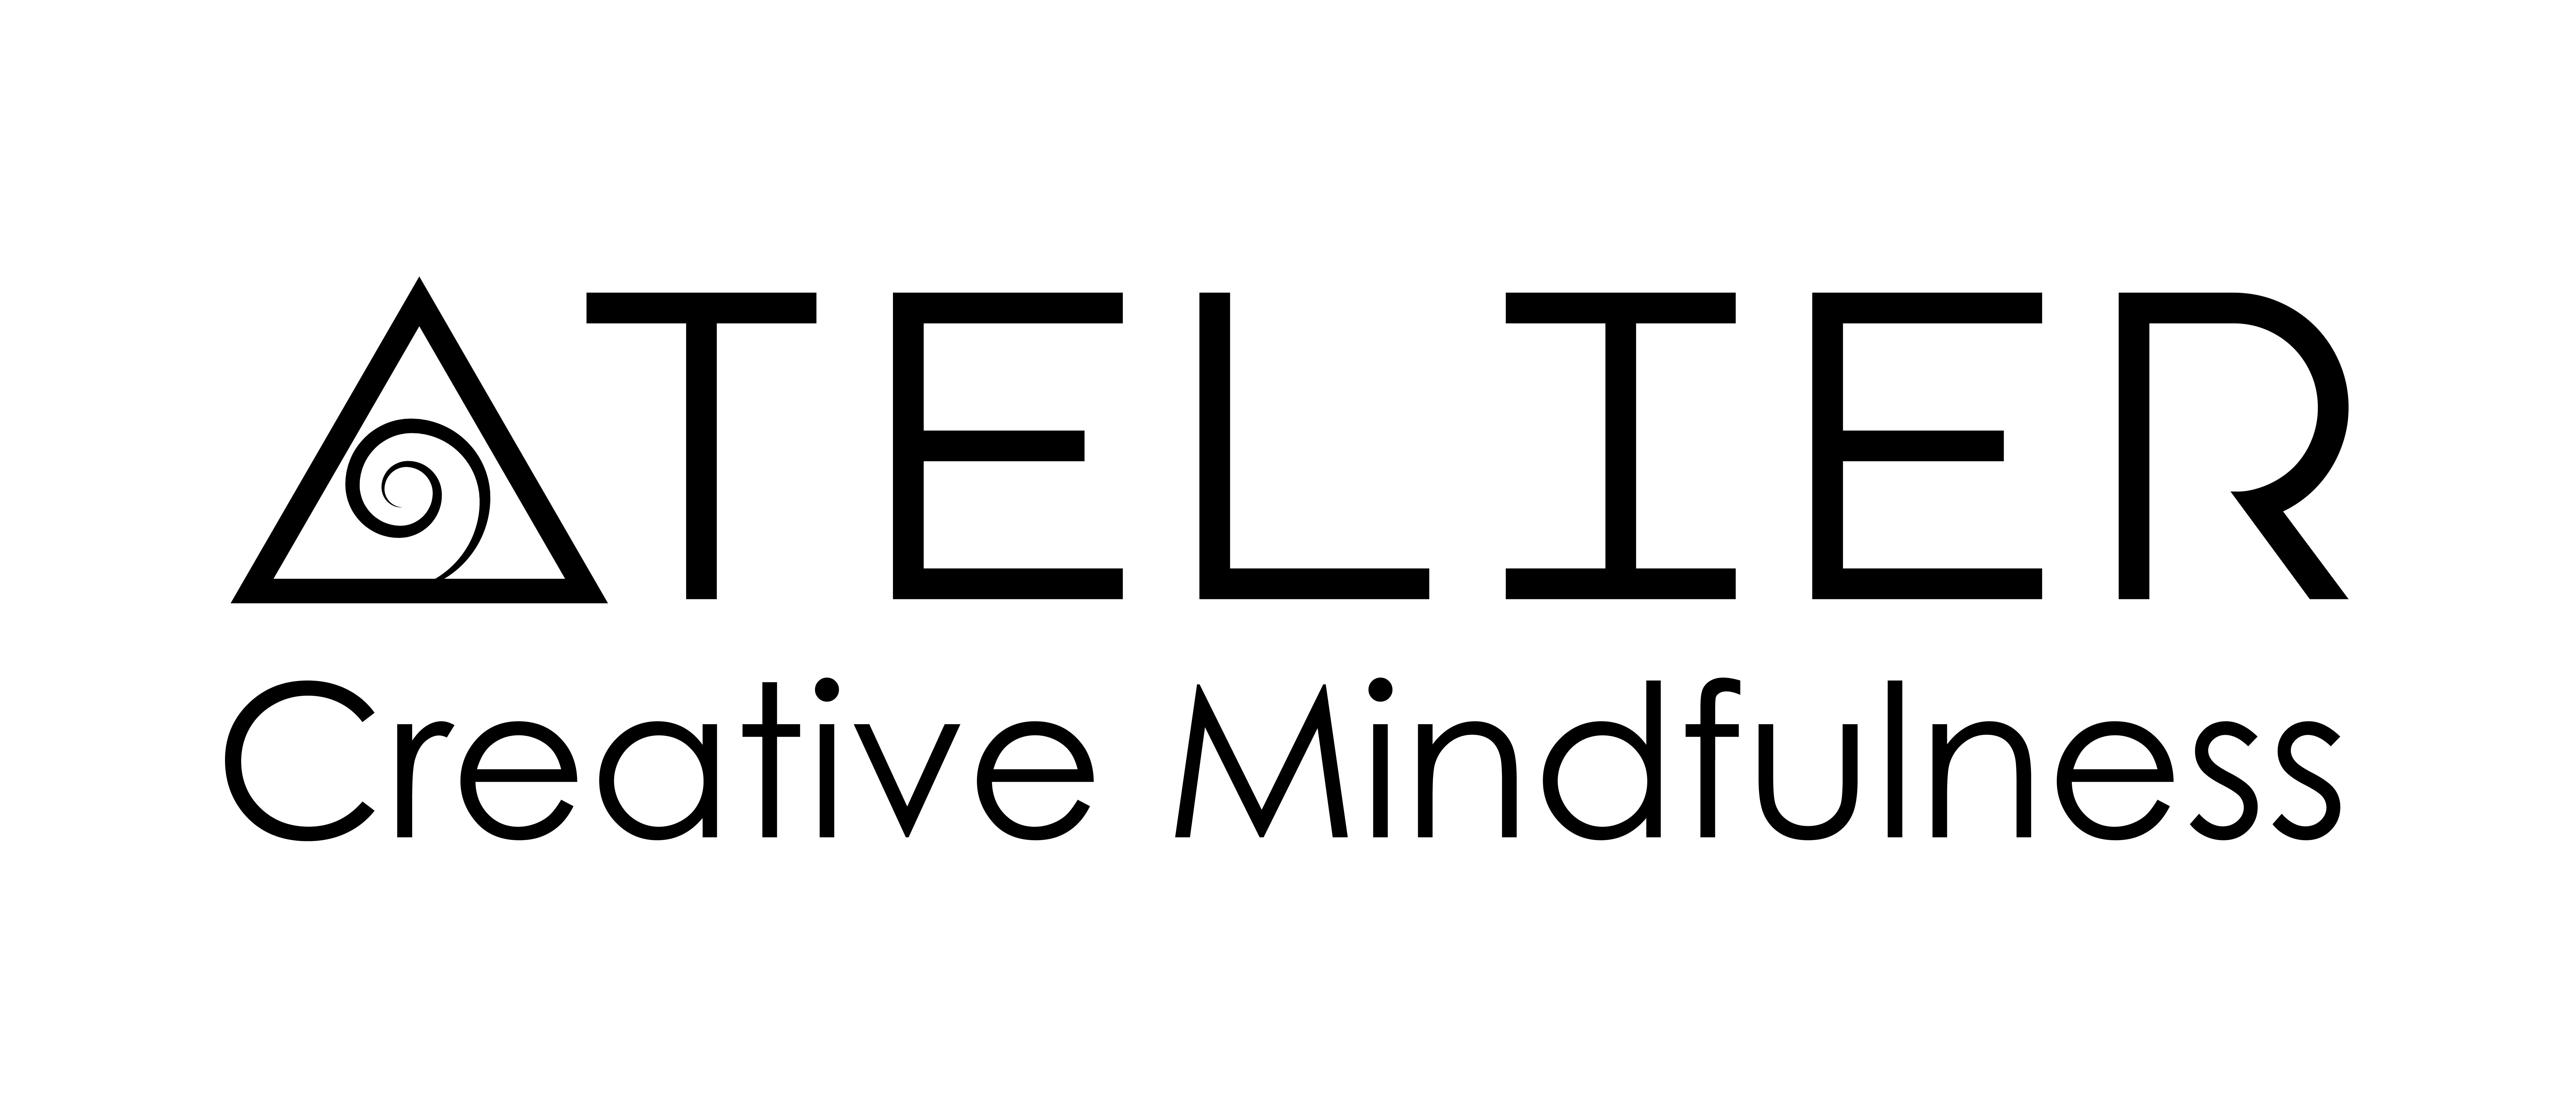 Atelier: Creative Mindfulness